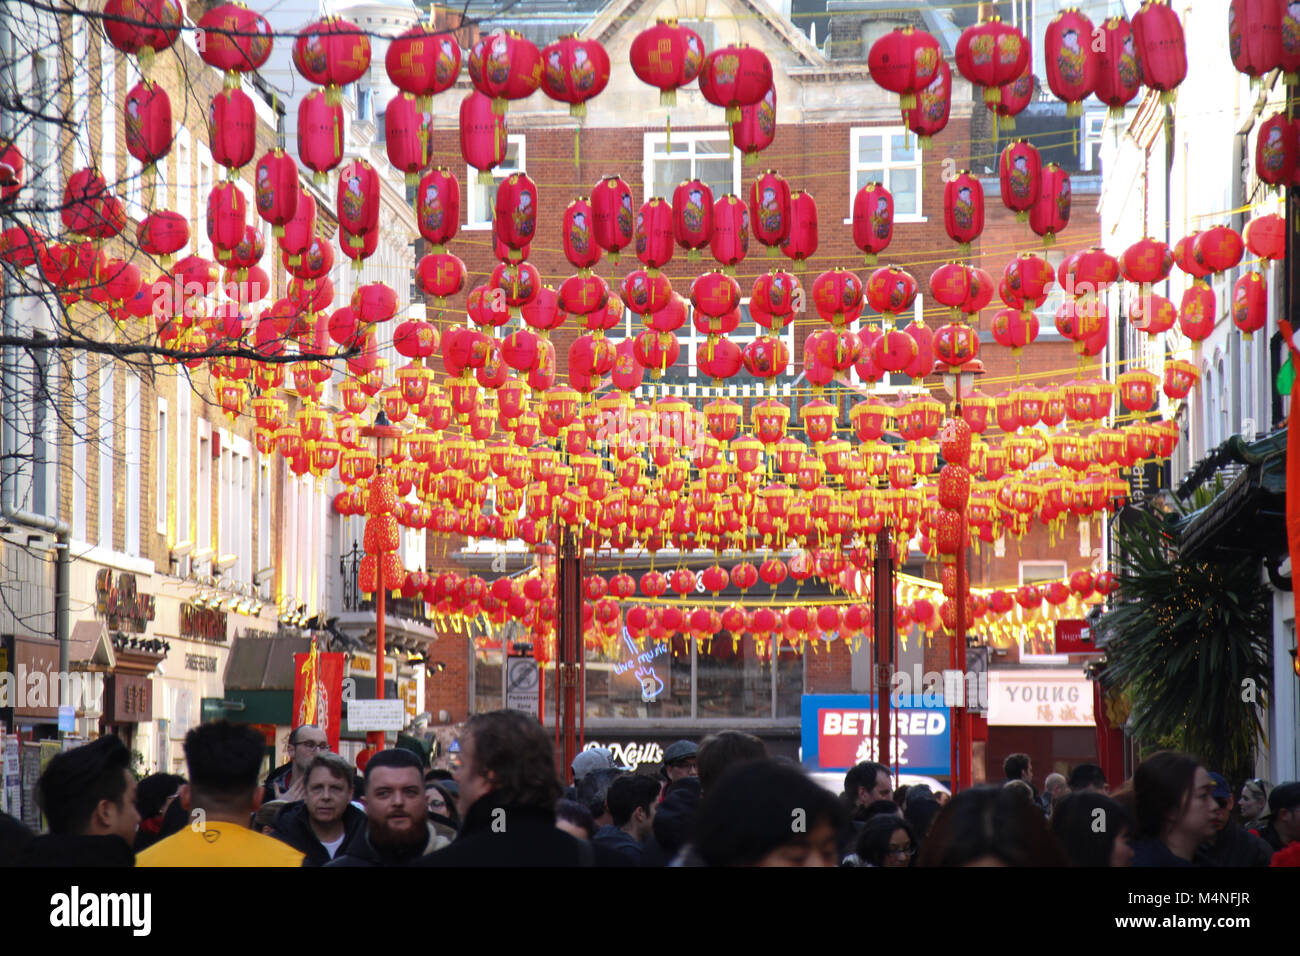 London, UK. 17th Feb, 2018. Londoners seen walkinb below Chinese lanterns in China Town London on 17 February 2018 - Stock Image